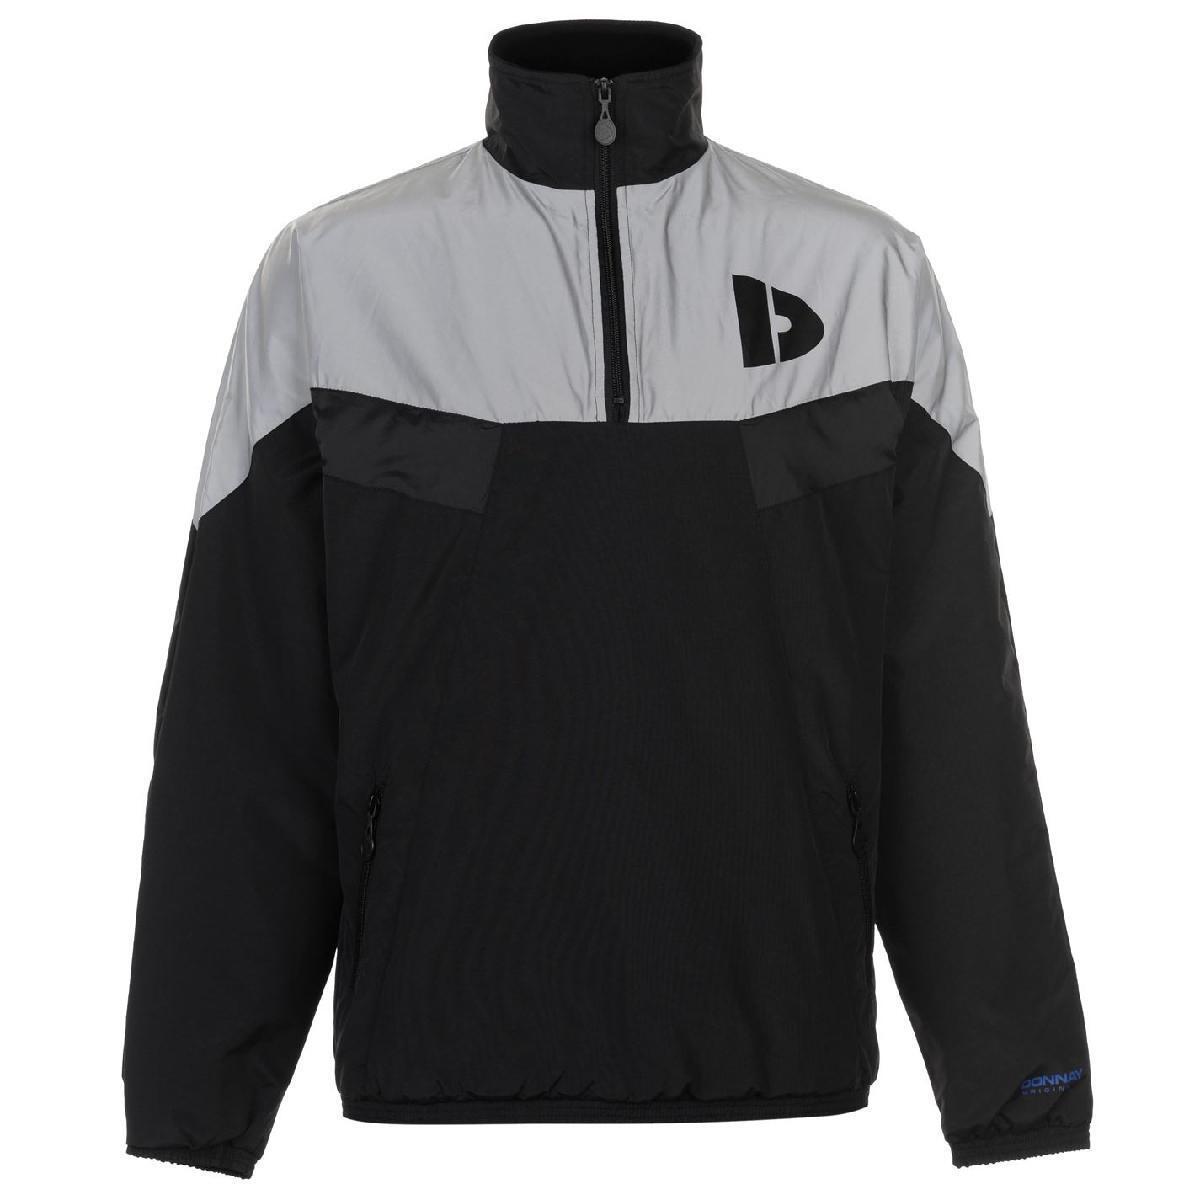 Damenschuhey Herren Pullover Sweatshirt Pulli Sweater Jumper Sport 4061